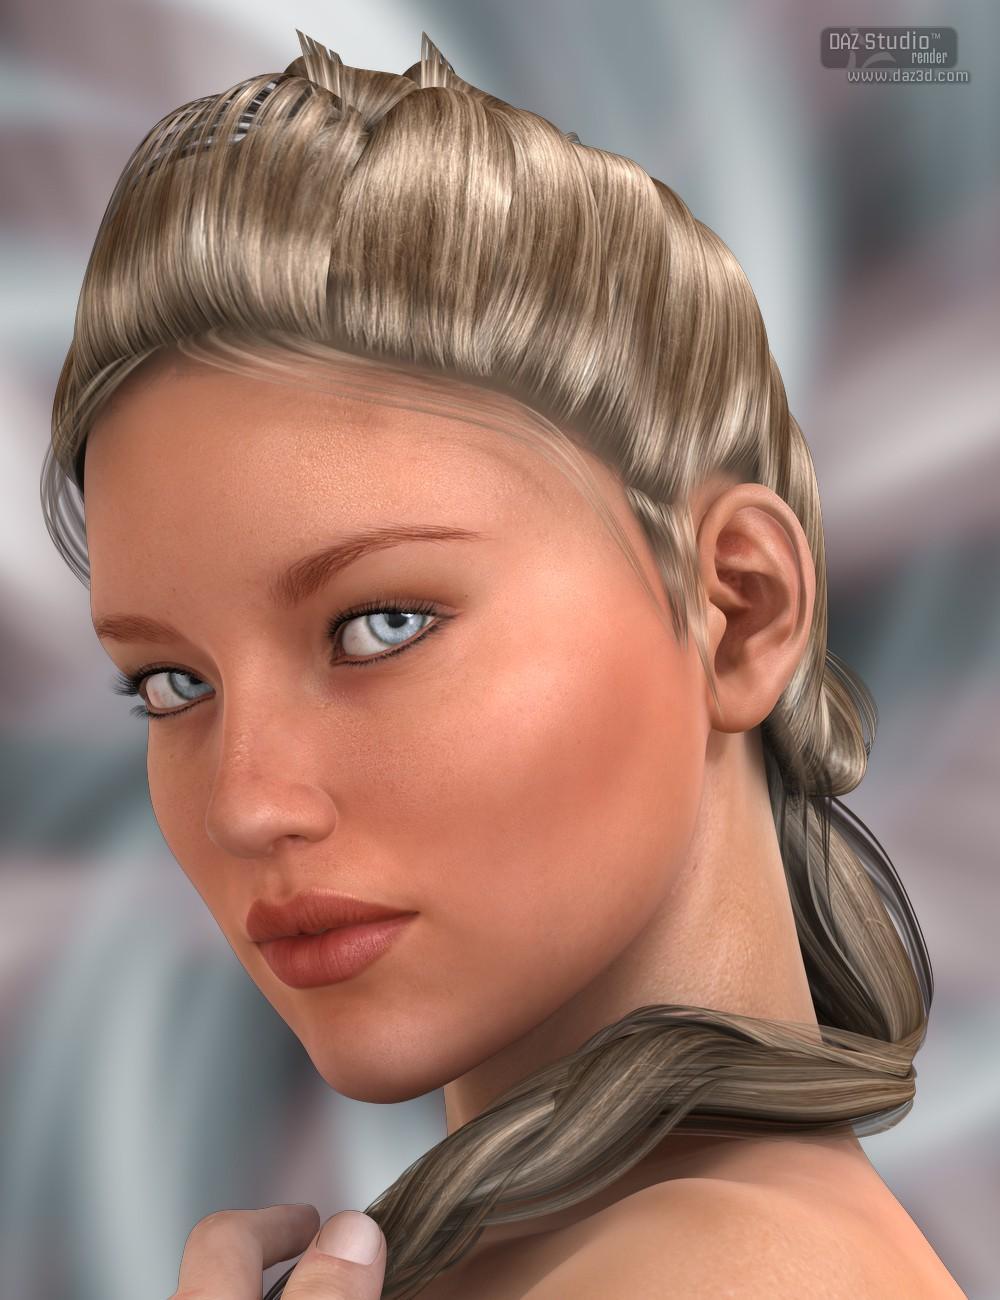 Danah Braid for Genesis 2 Female(s)